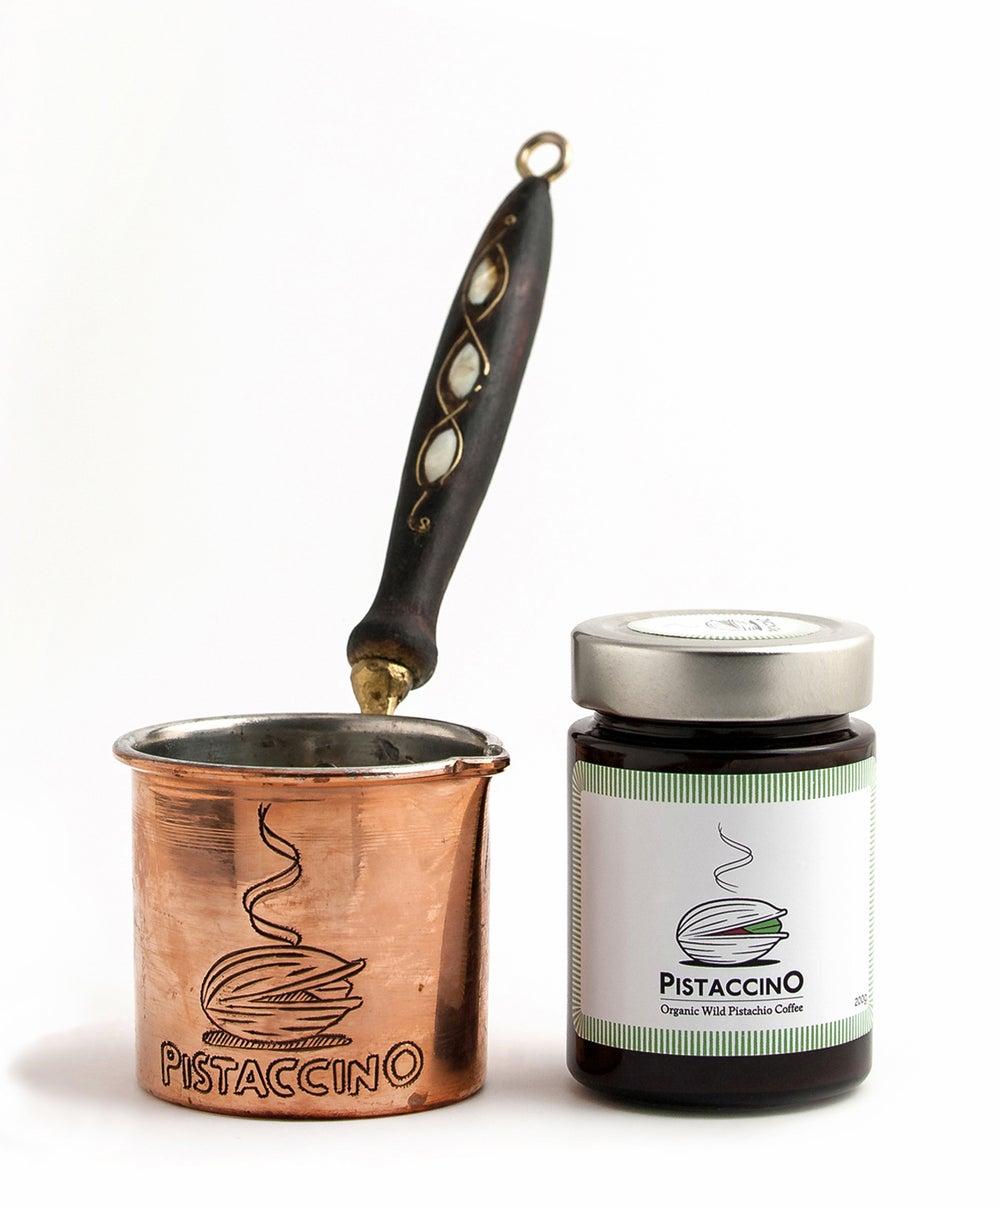 Image of Kombipaket Pistaccino & Kupferkanne